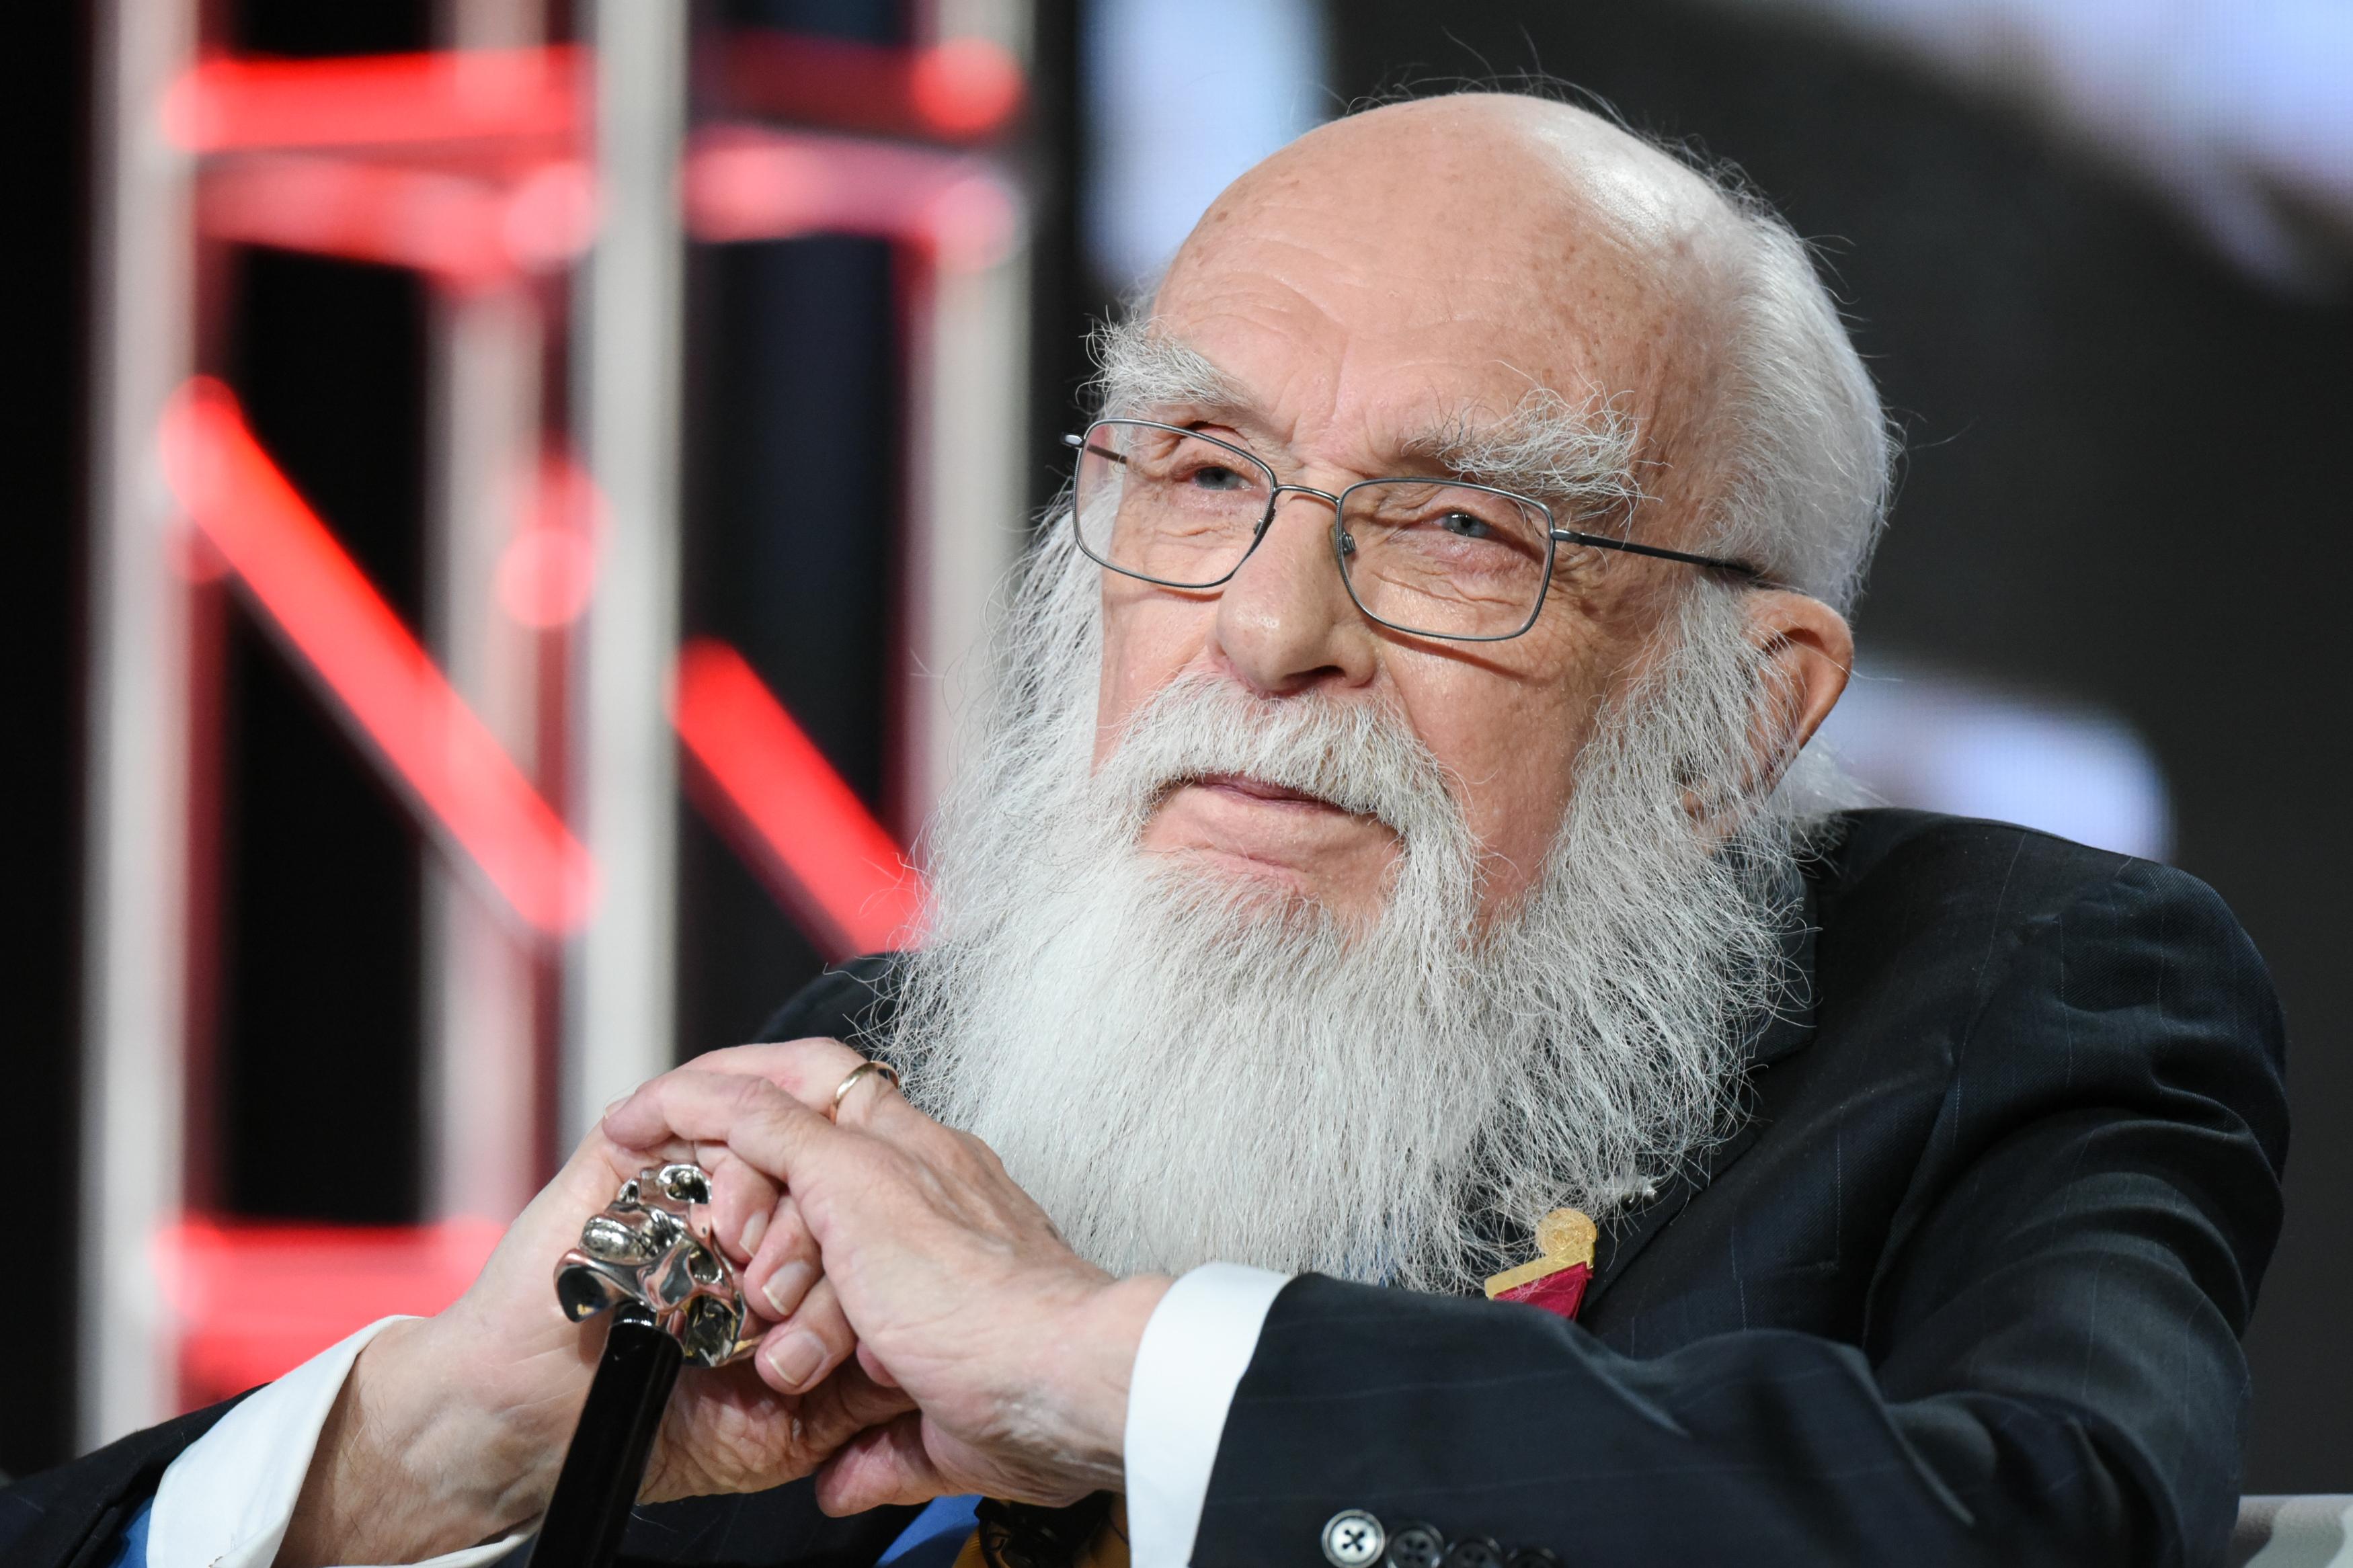 James Randi, famed magician and paranormal skeptic, has died at age 92